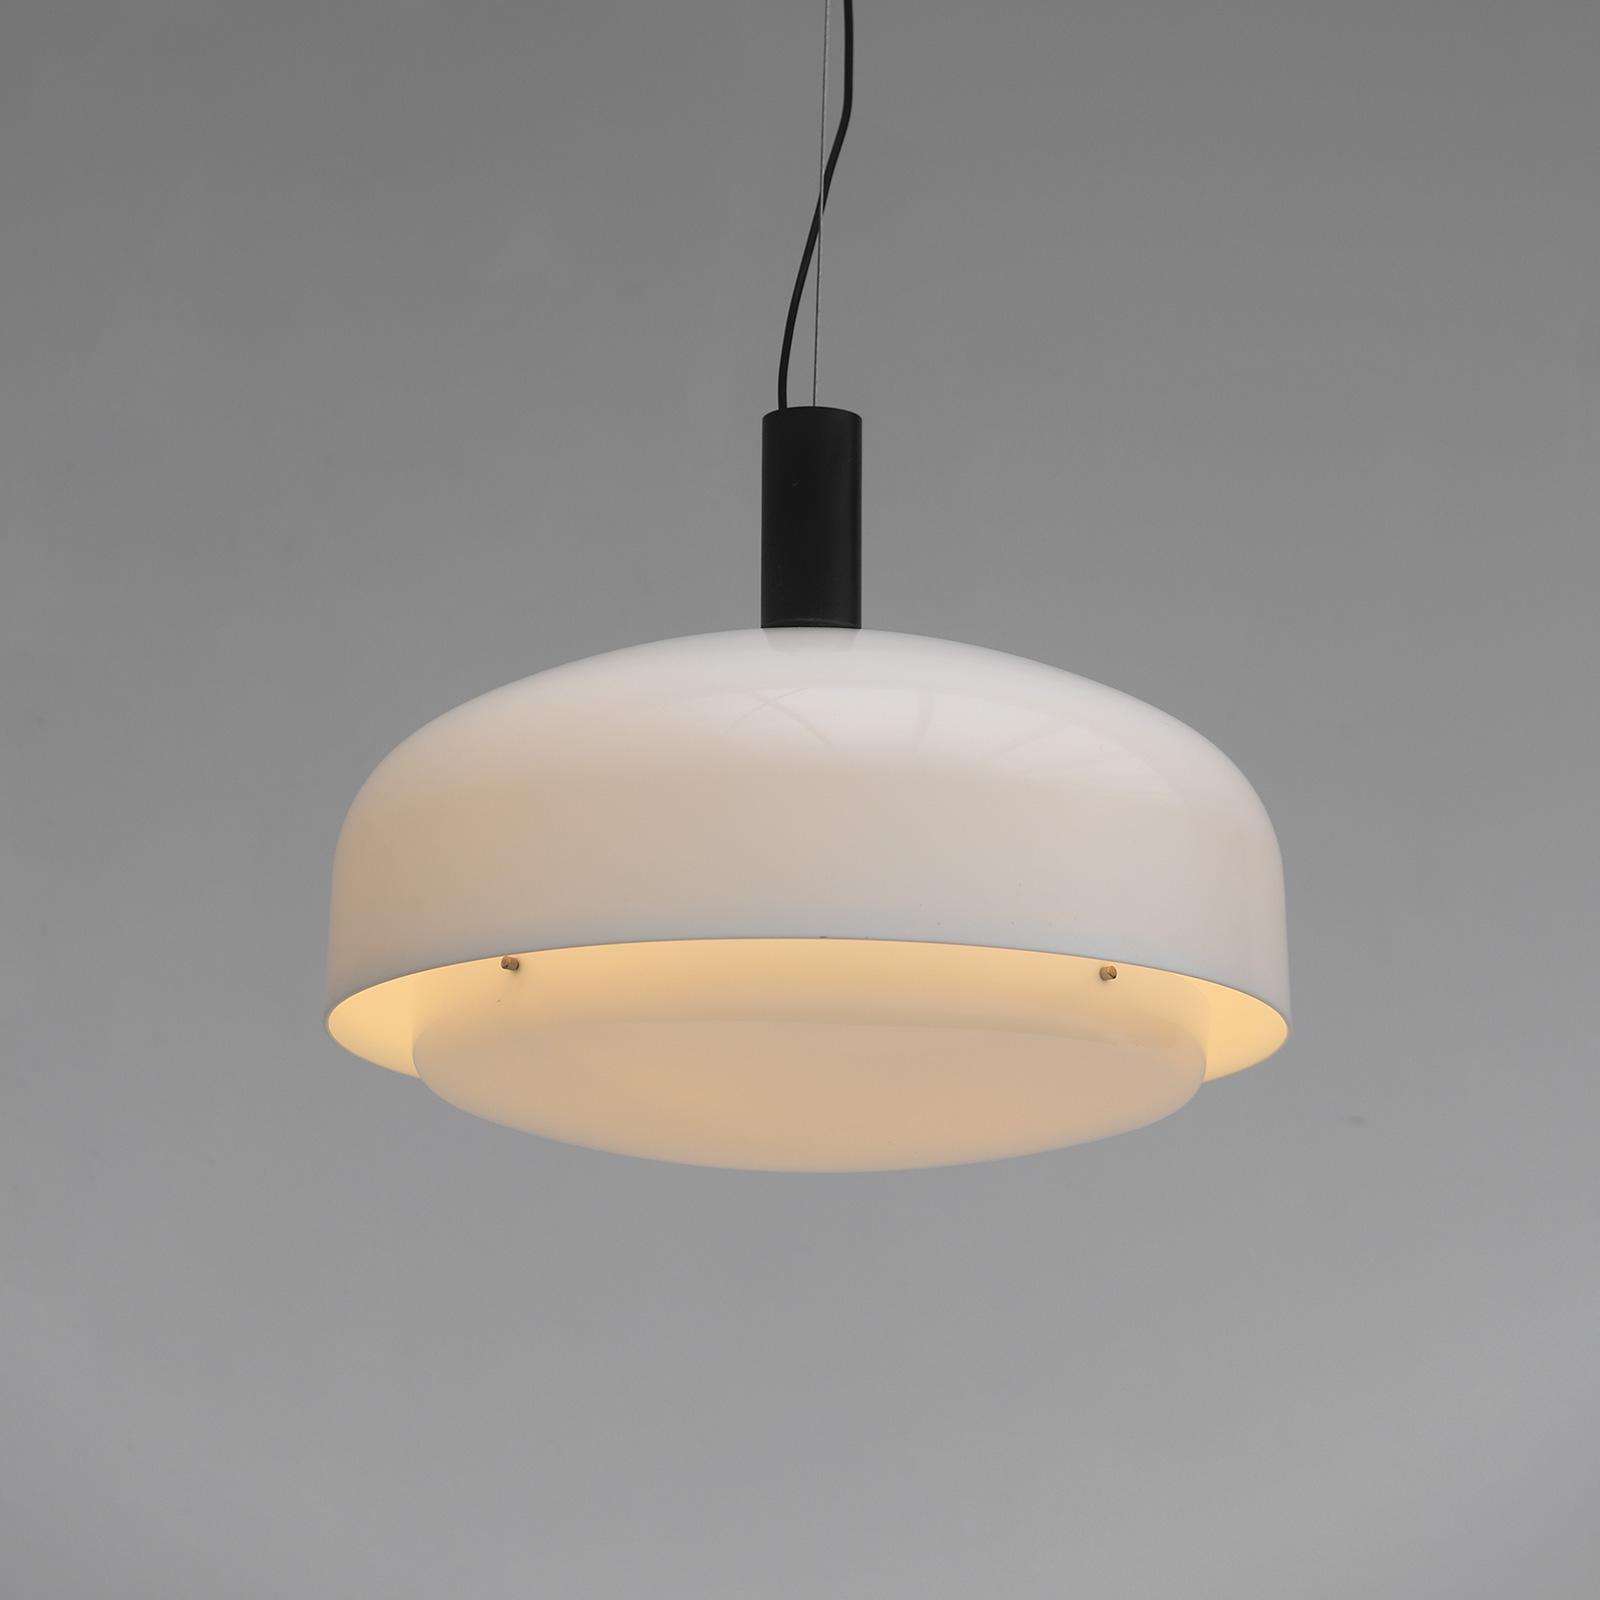 Eugenio Gentile Kartell kd62 Pendant Lamp